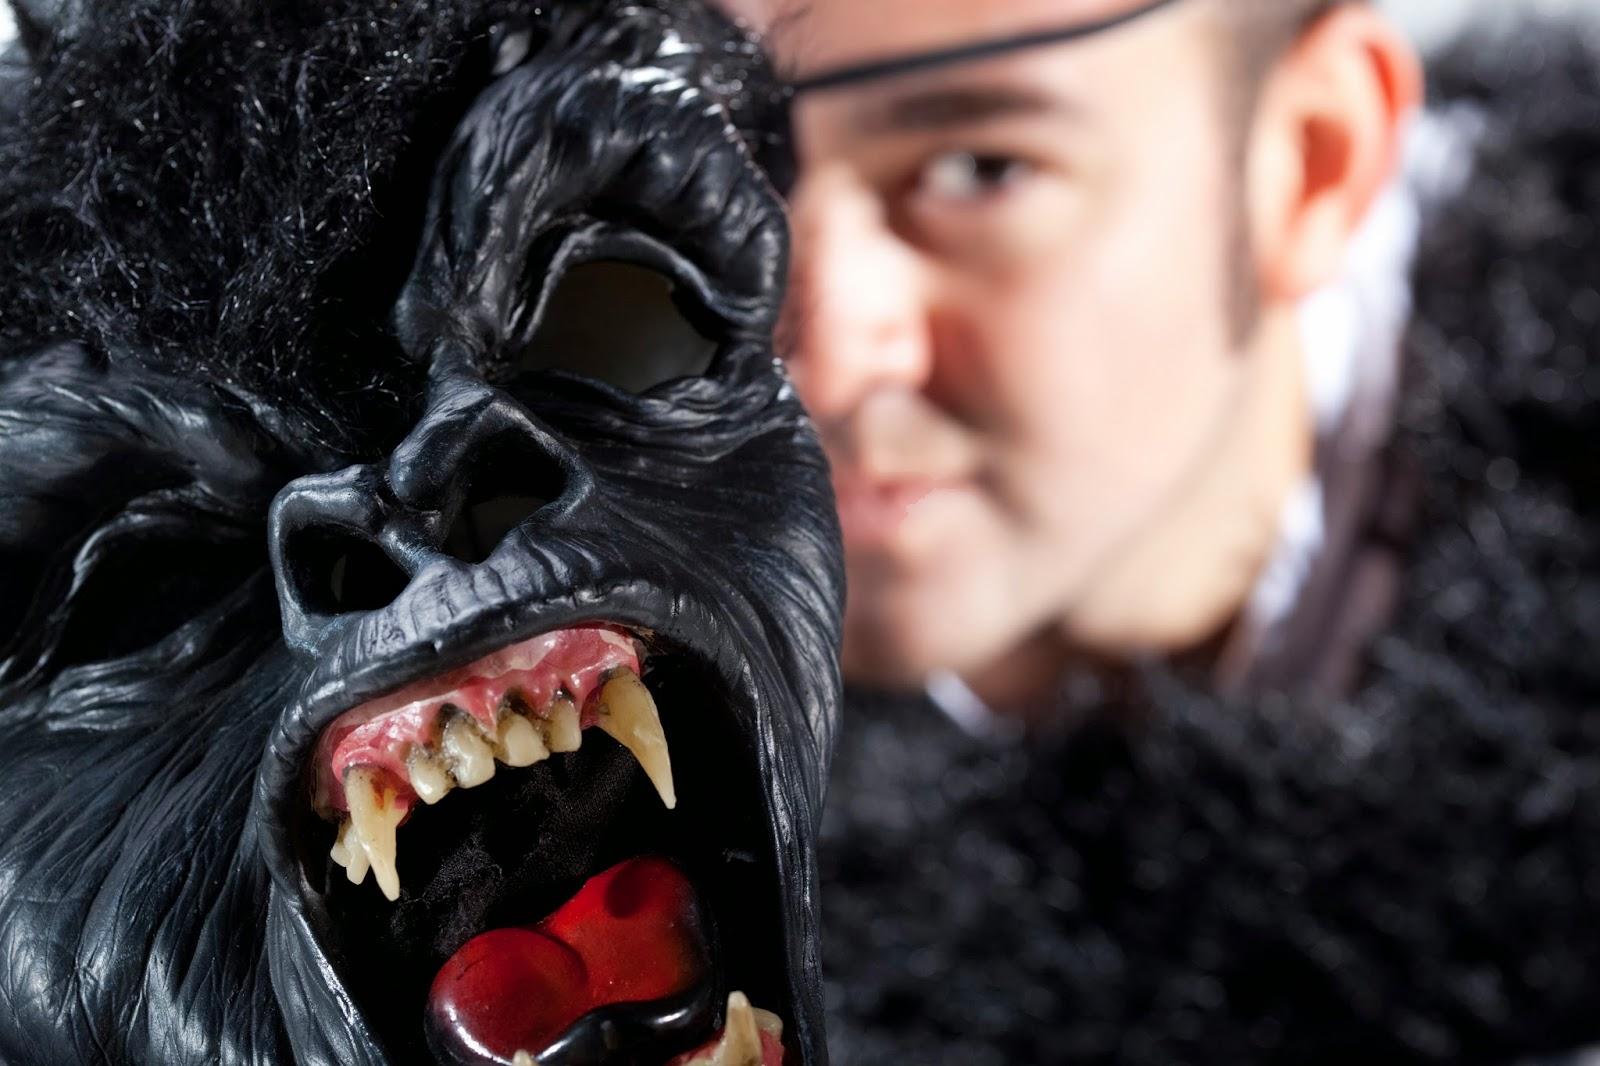 Man holding gorilla mask